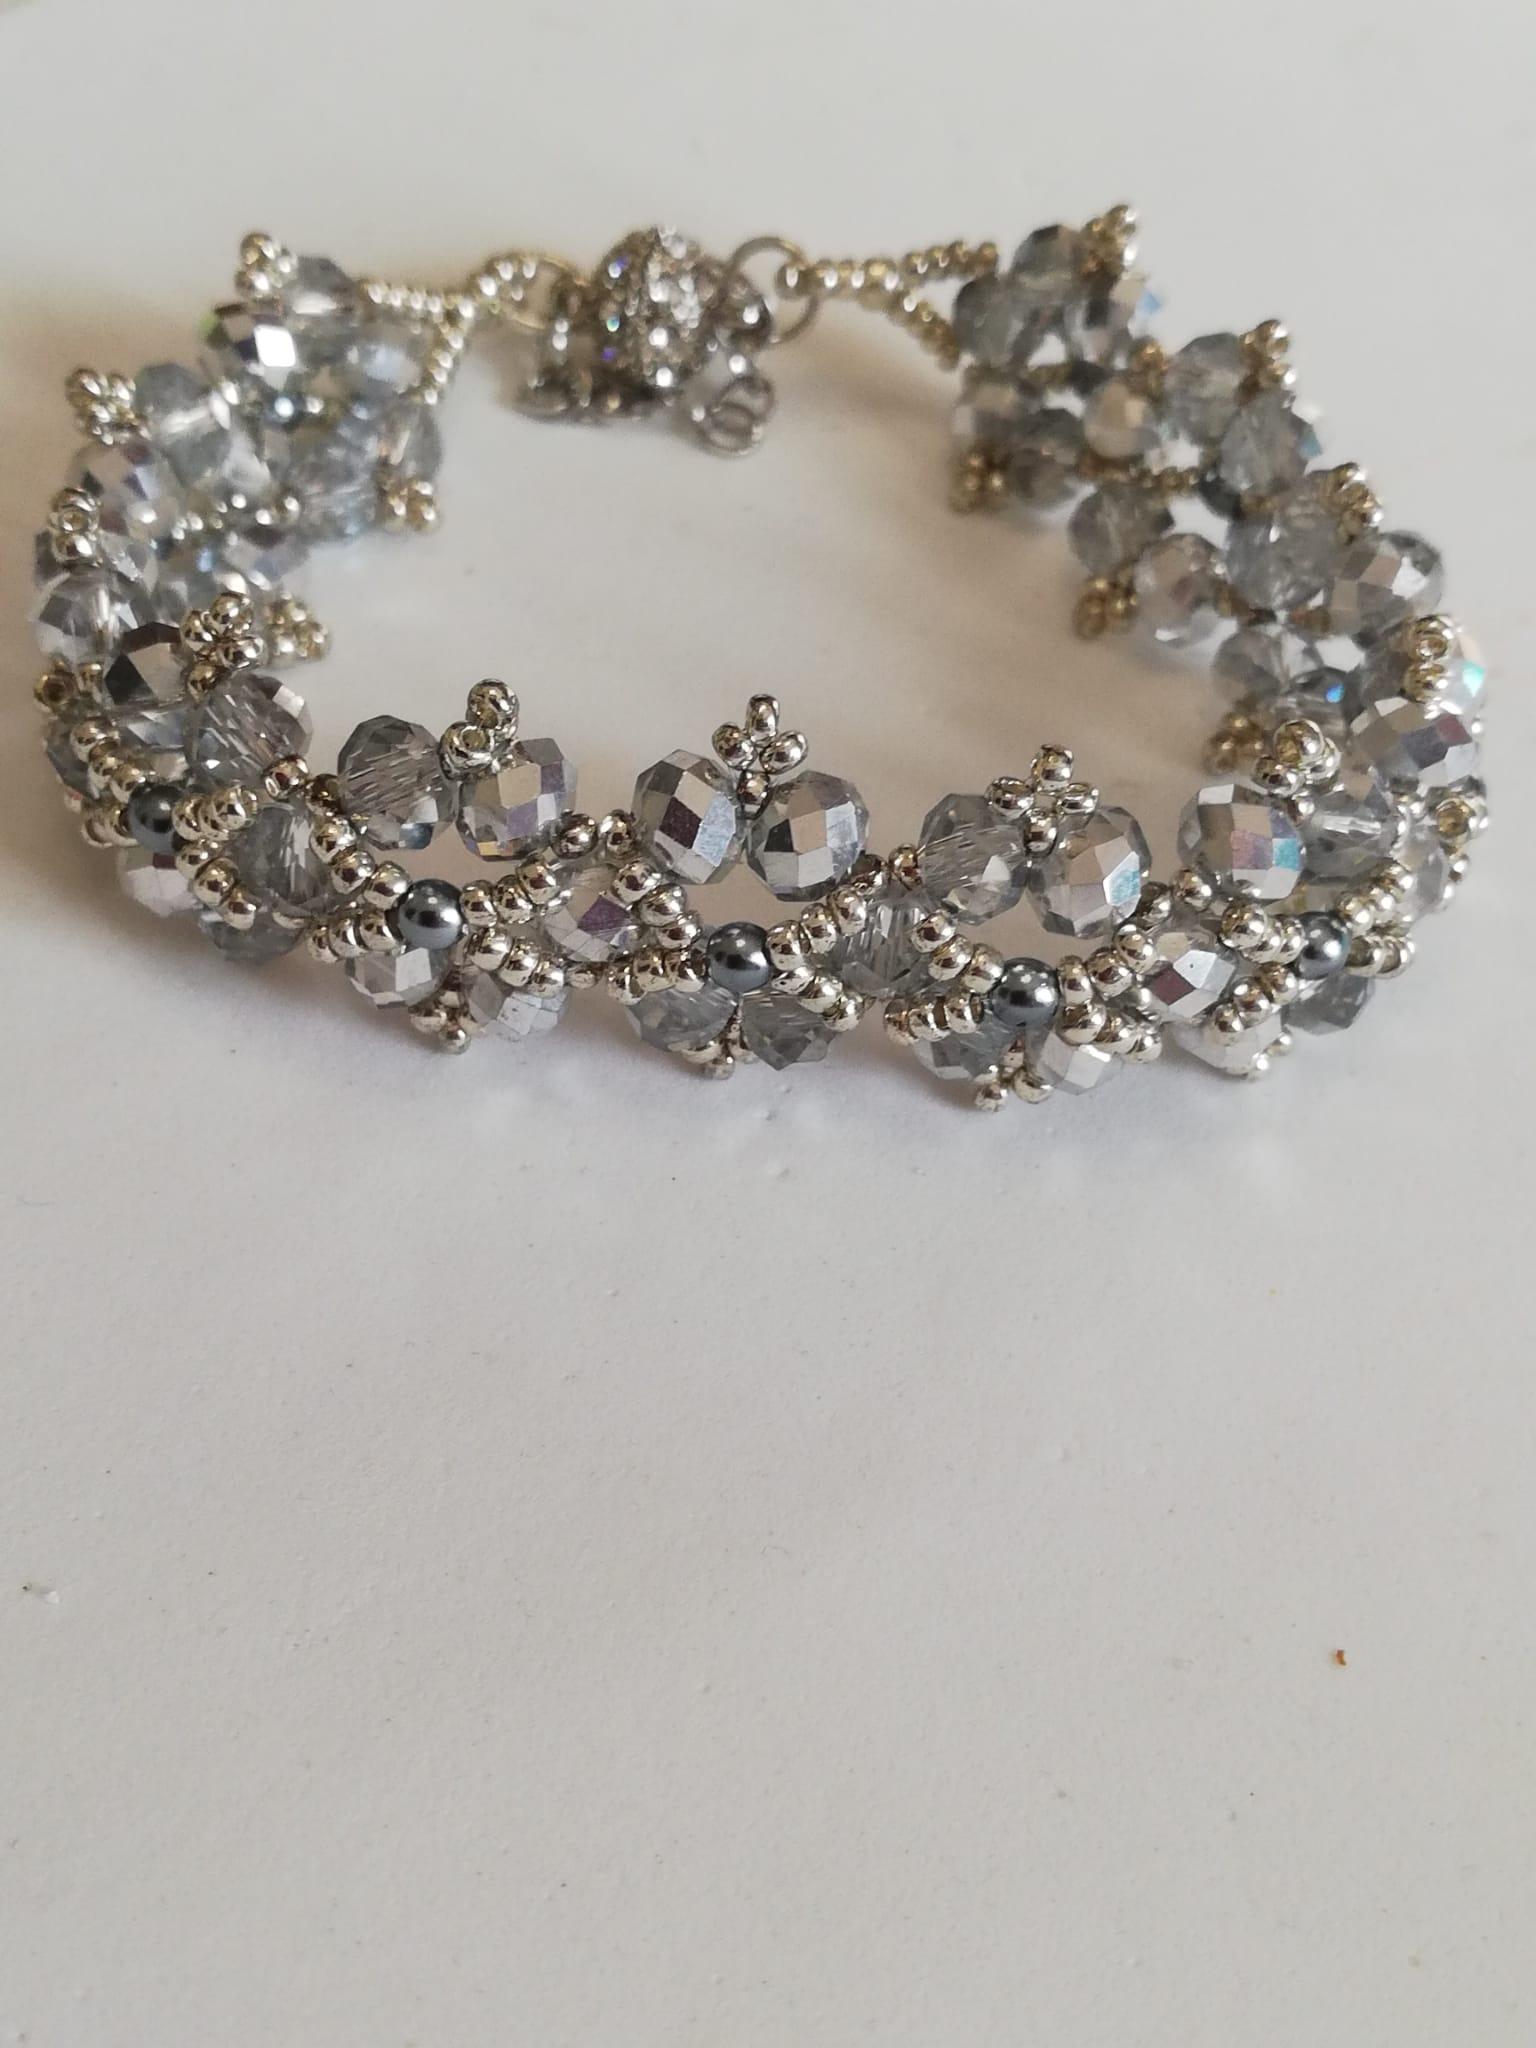 Handmade bracelet | Handmade jewellery online